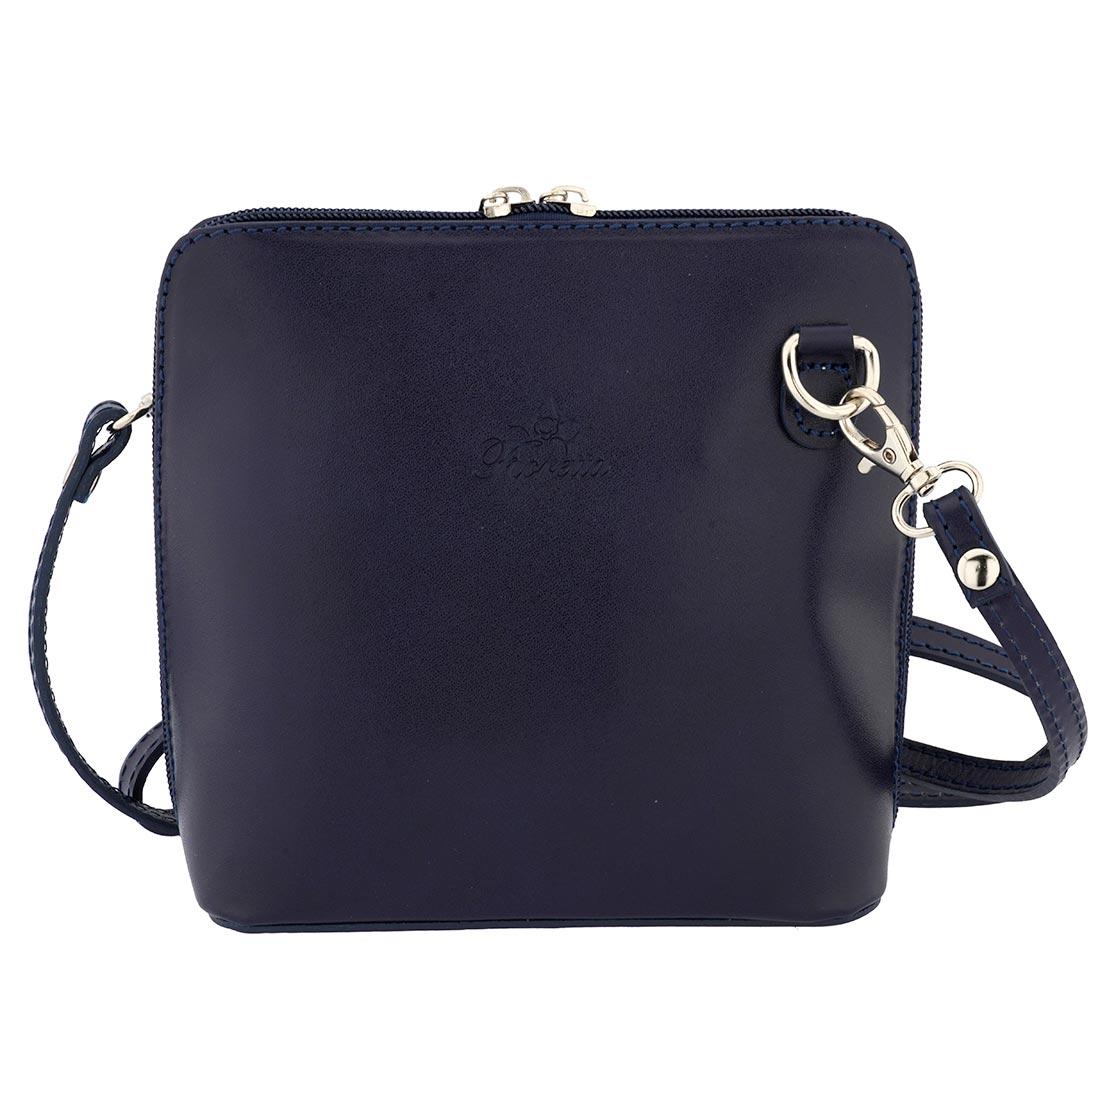 Fioretta Italian Genuine Leather Small Crossbody Bag Shoulder Bag Purse For Women - Blue